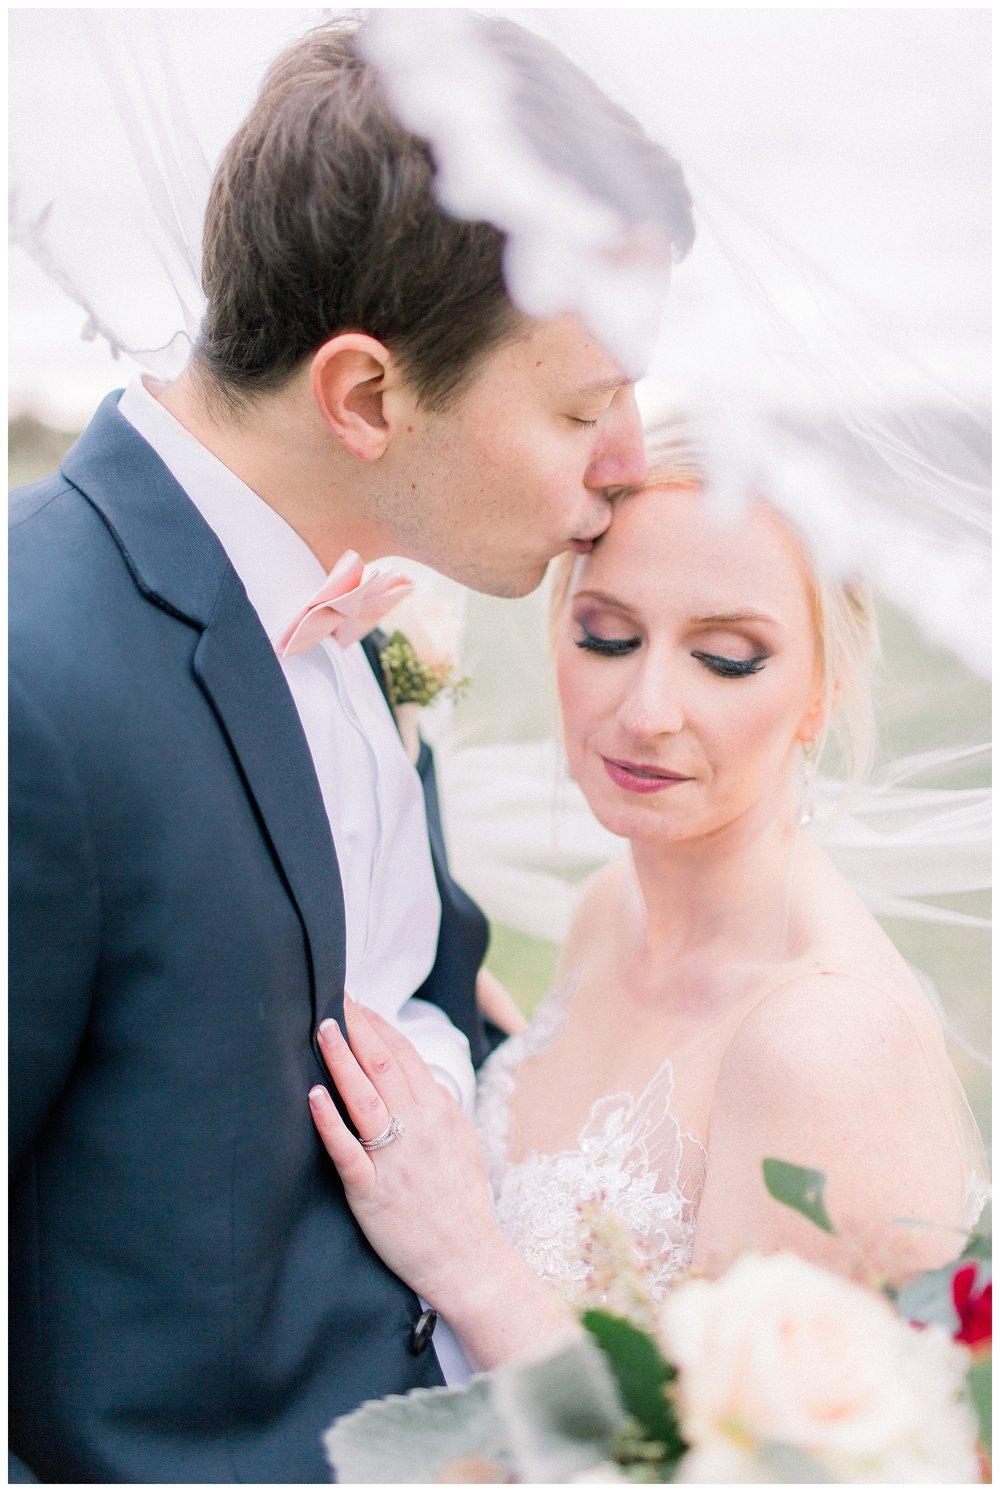 Whitehall Estate Wedding | Northern Virginia Wedding Photographer Kir Tuben_0089.jpg